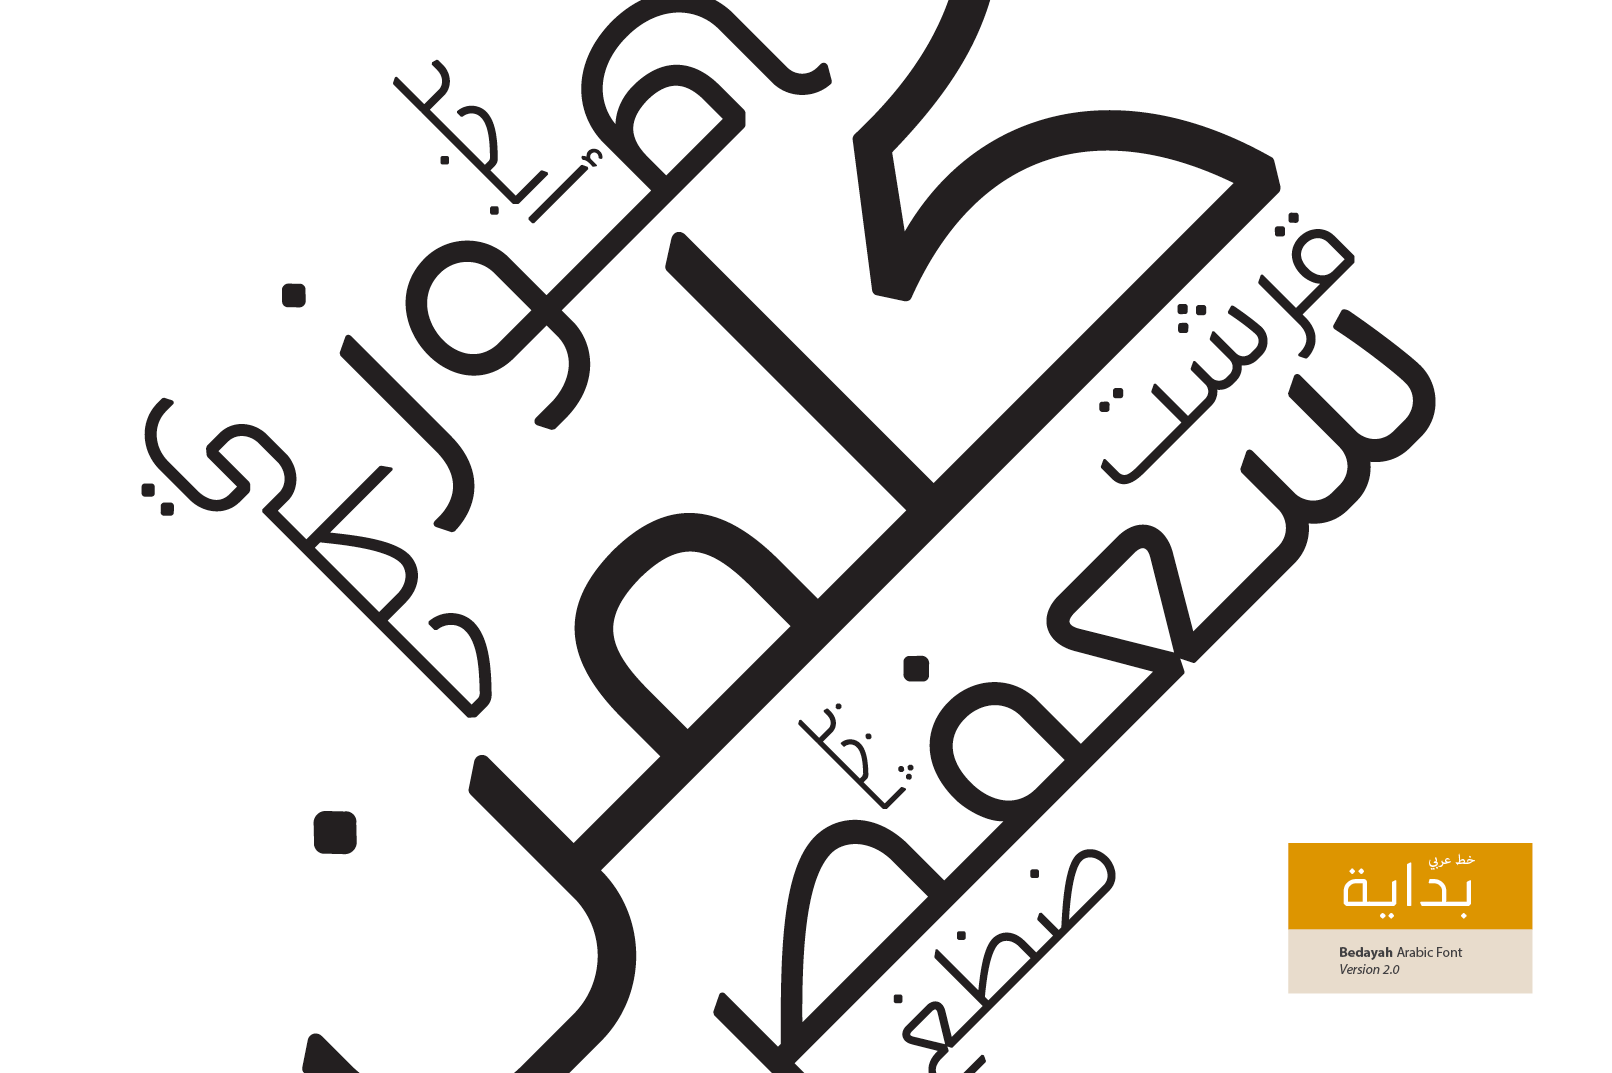 Bedayah - Arabic Font example image 1